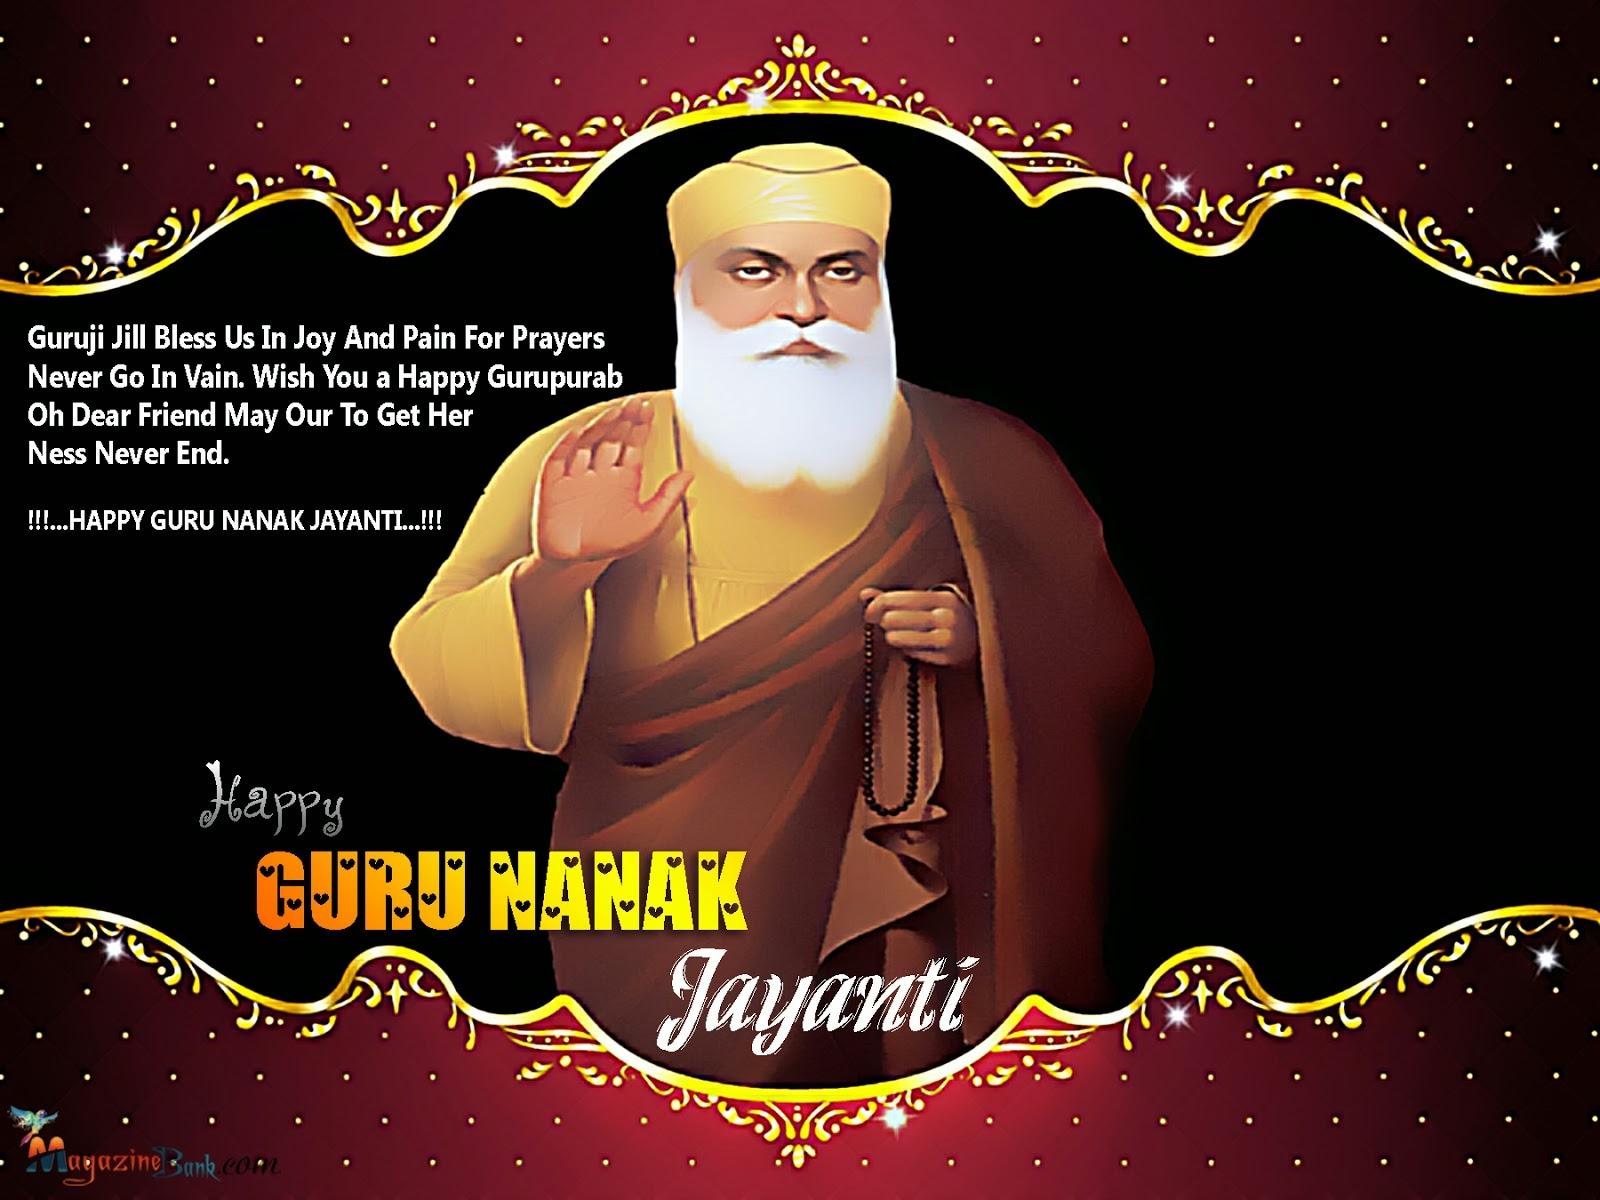 Sms Message Quotes Image Hd Wallpaper Guru Nanak Jayanti In Hindi